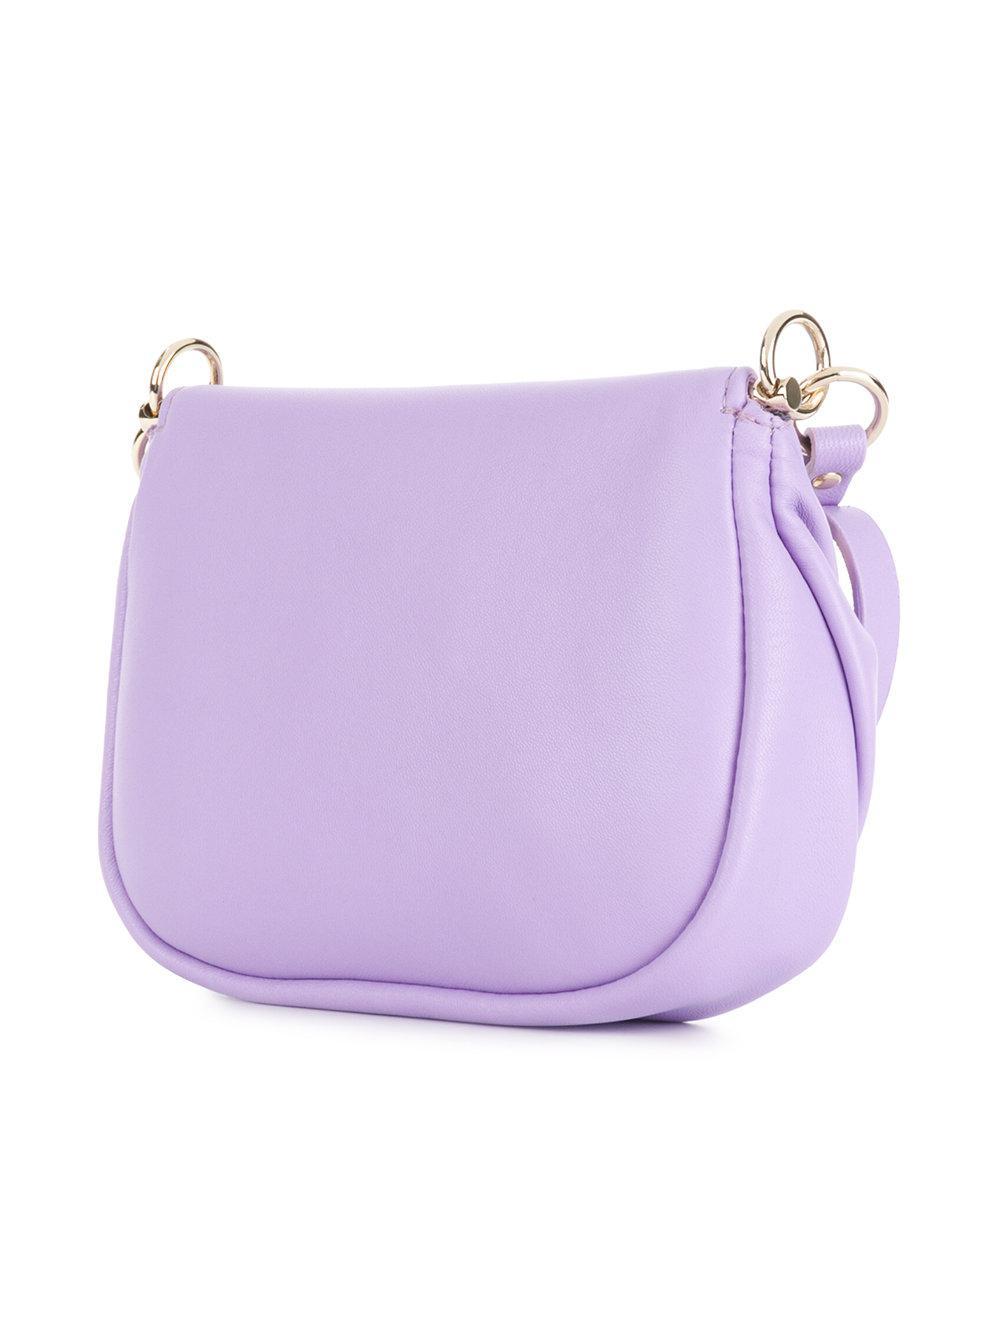 Versace Metalways shoulder bag - Pink & Purple iTocHnS9